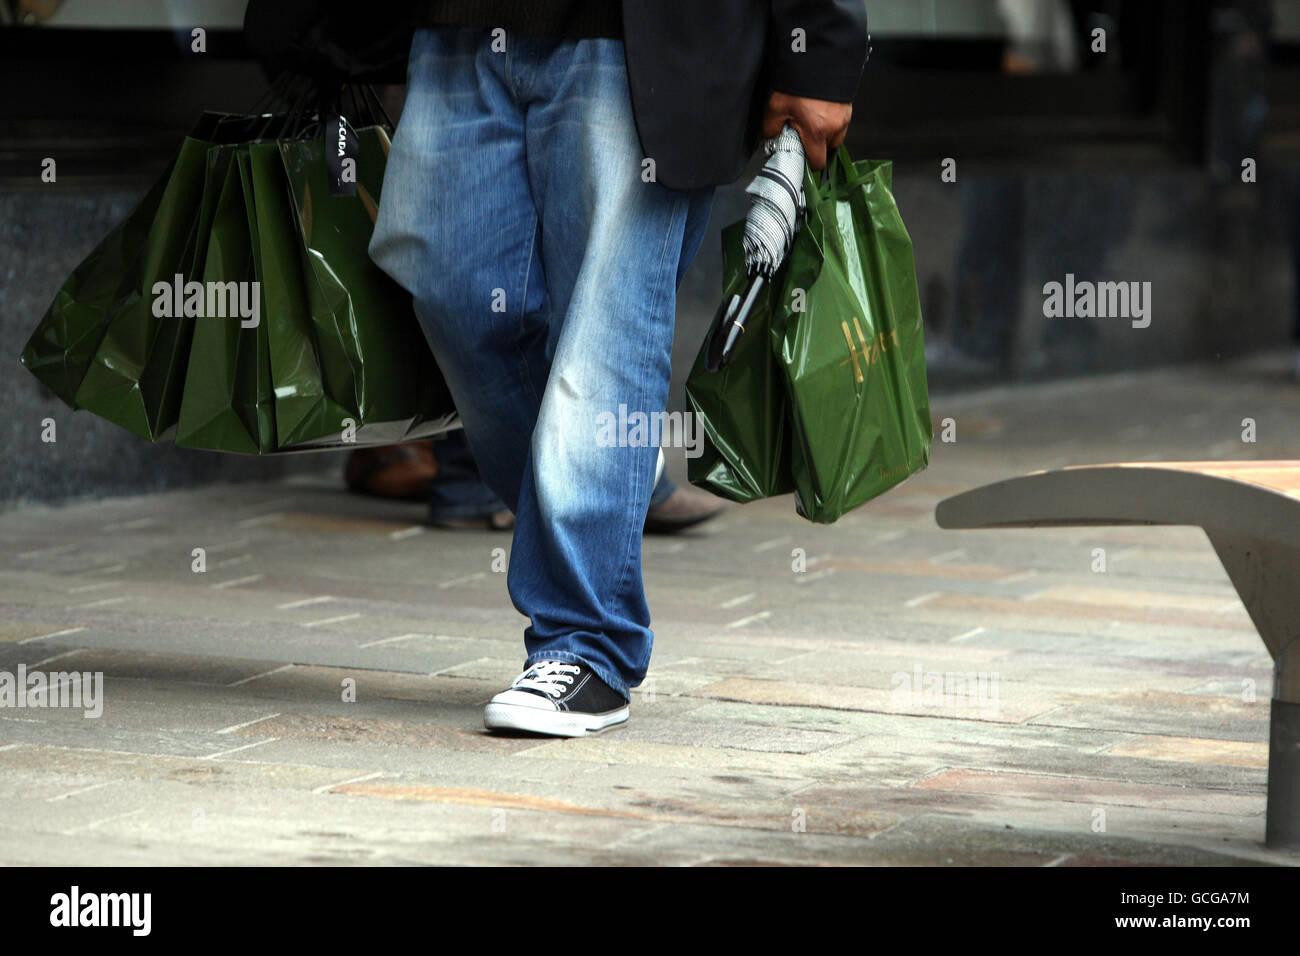 Harrods Shopping Bags Fotos e Imágenes de stock Alamy